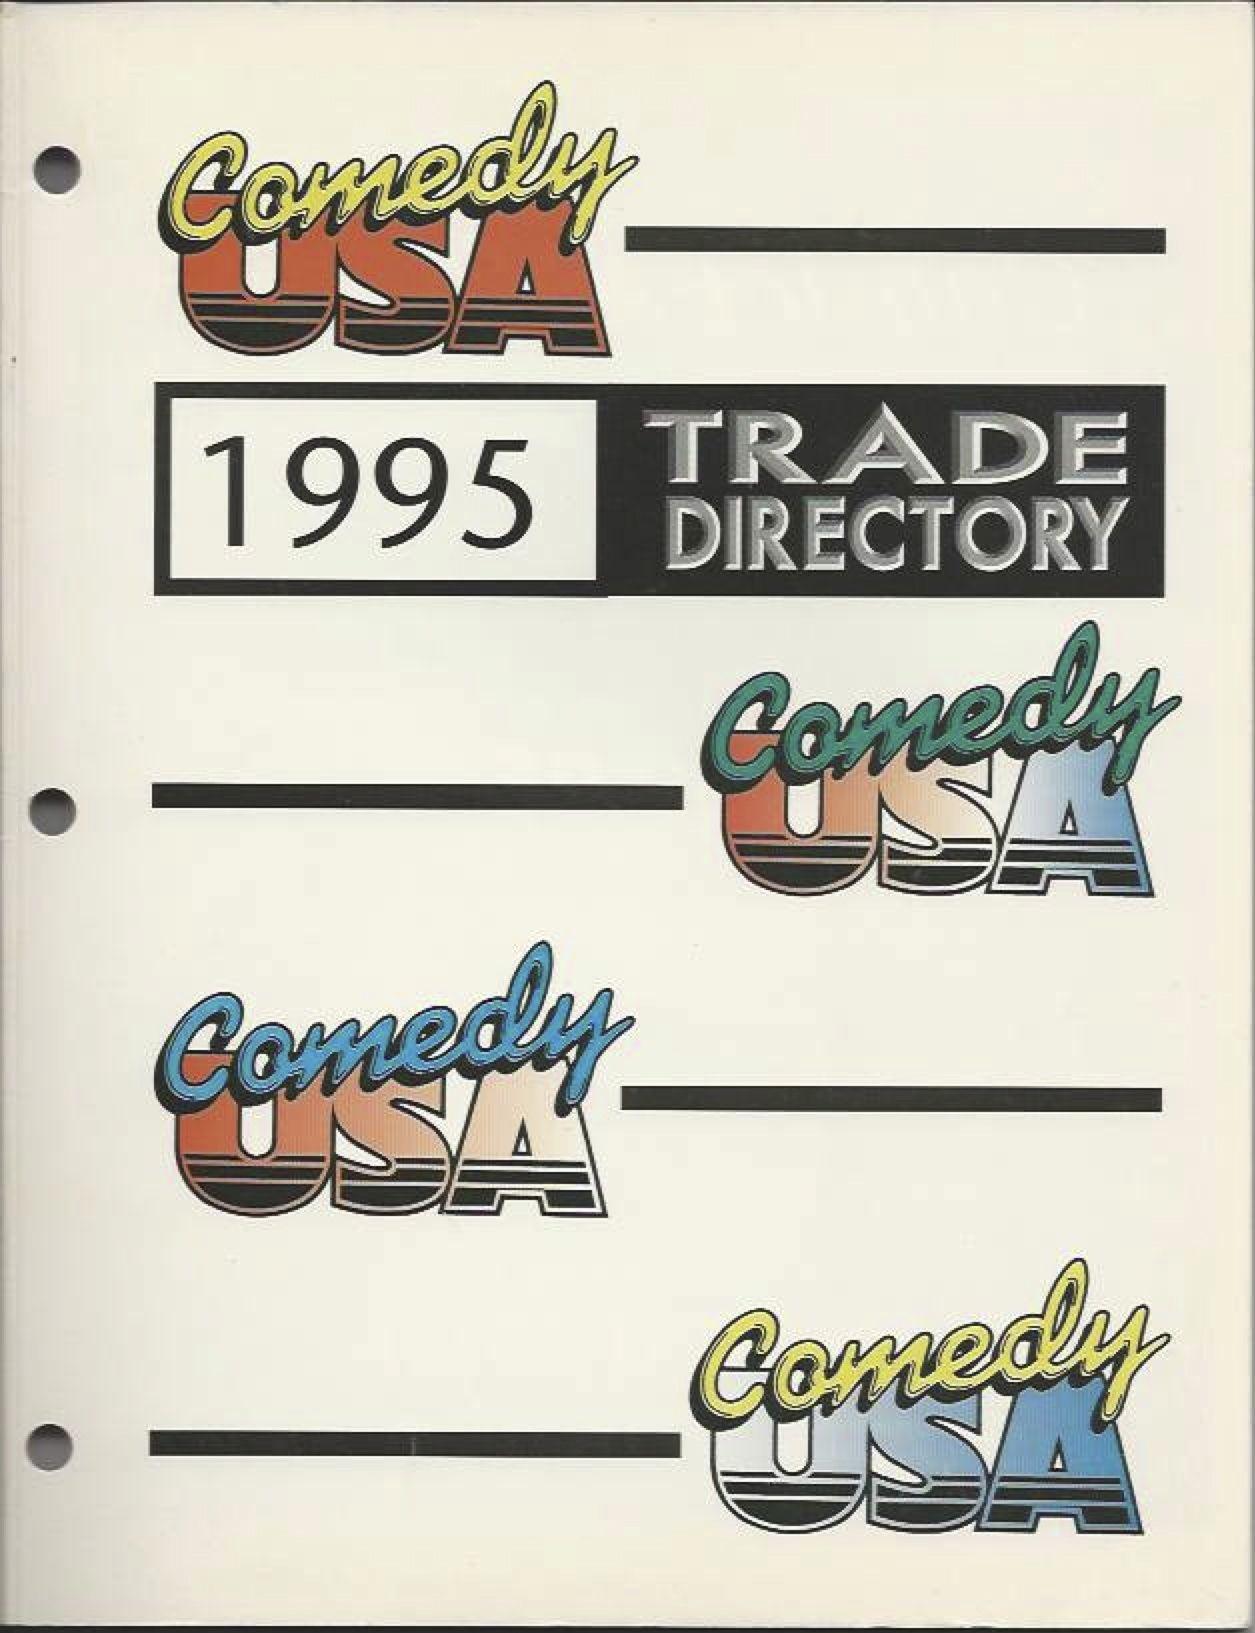 95Trade Directory